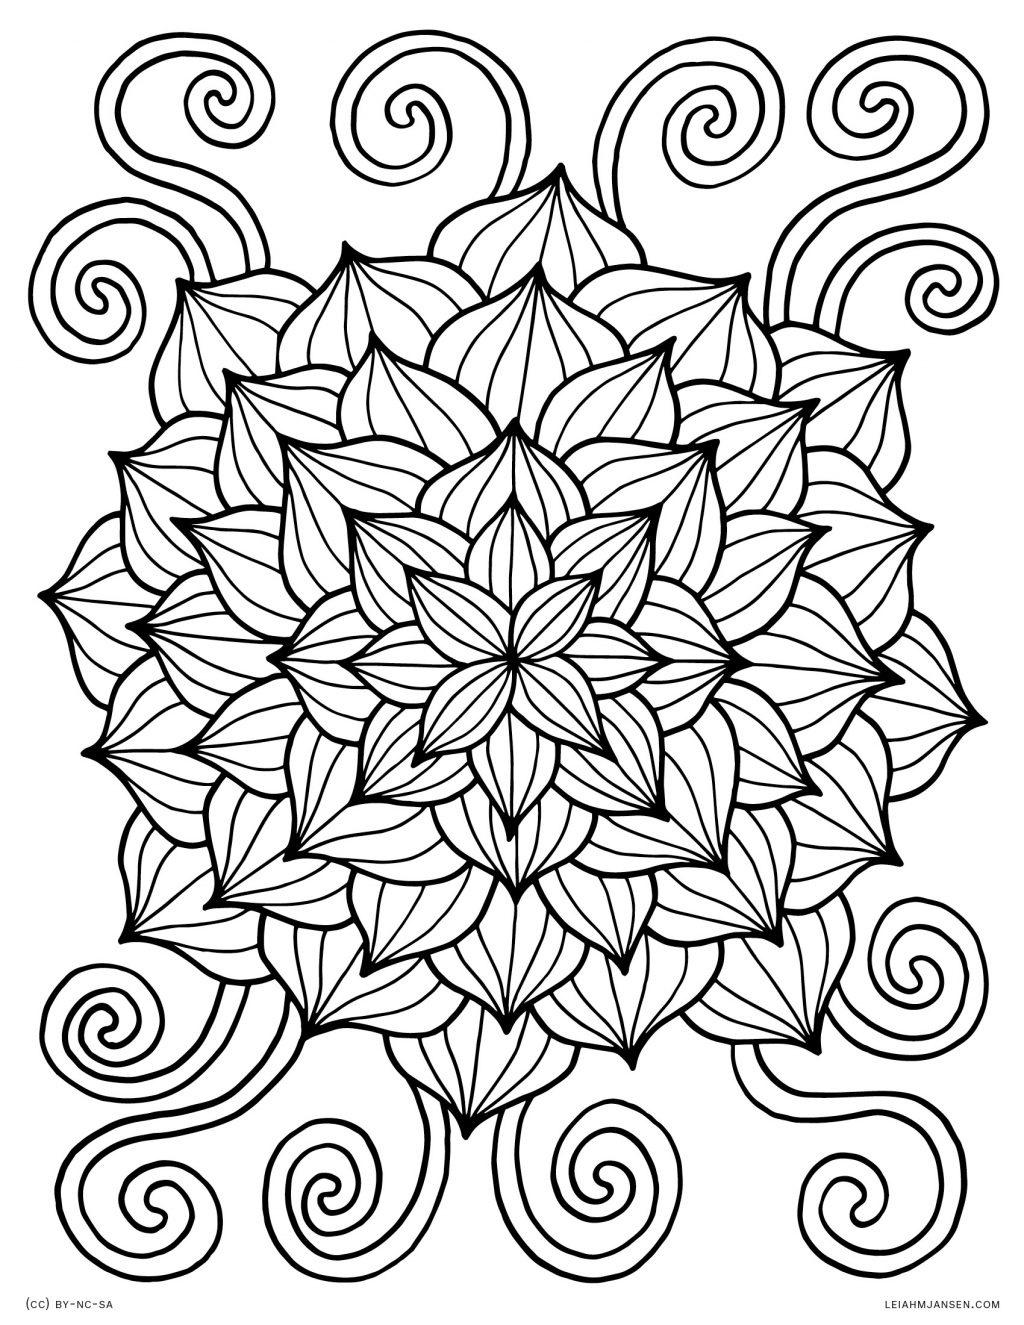 Coloring Page ~ Coloring Page Lmj Lotus Burst Pages Free Printable - Free Printable Coloring Pages